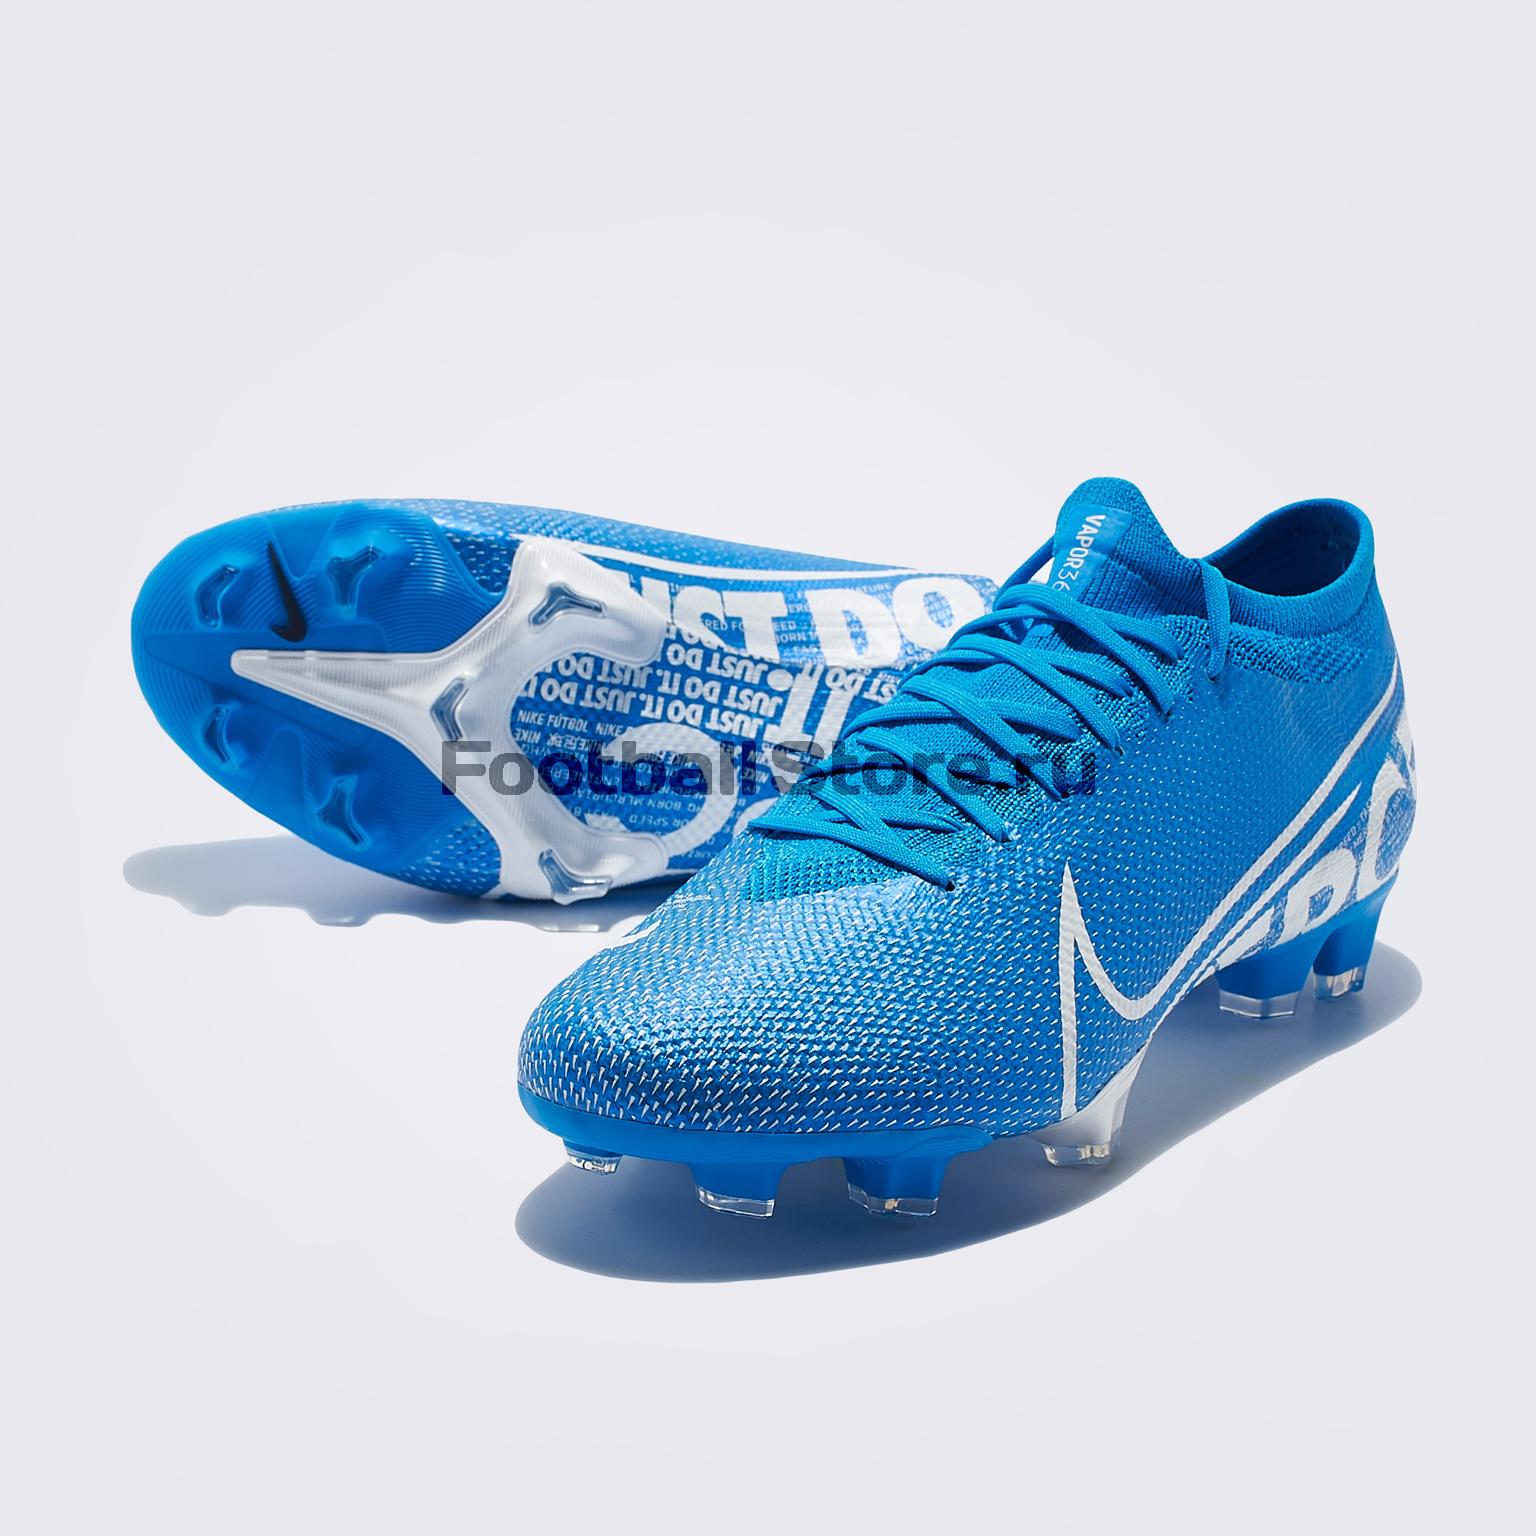 Бутсы Nike Vapor 13 Pro FG AT7901-414